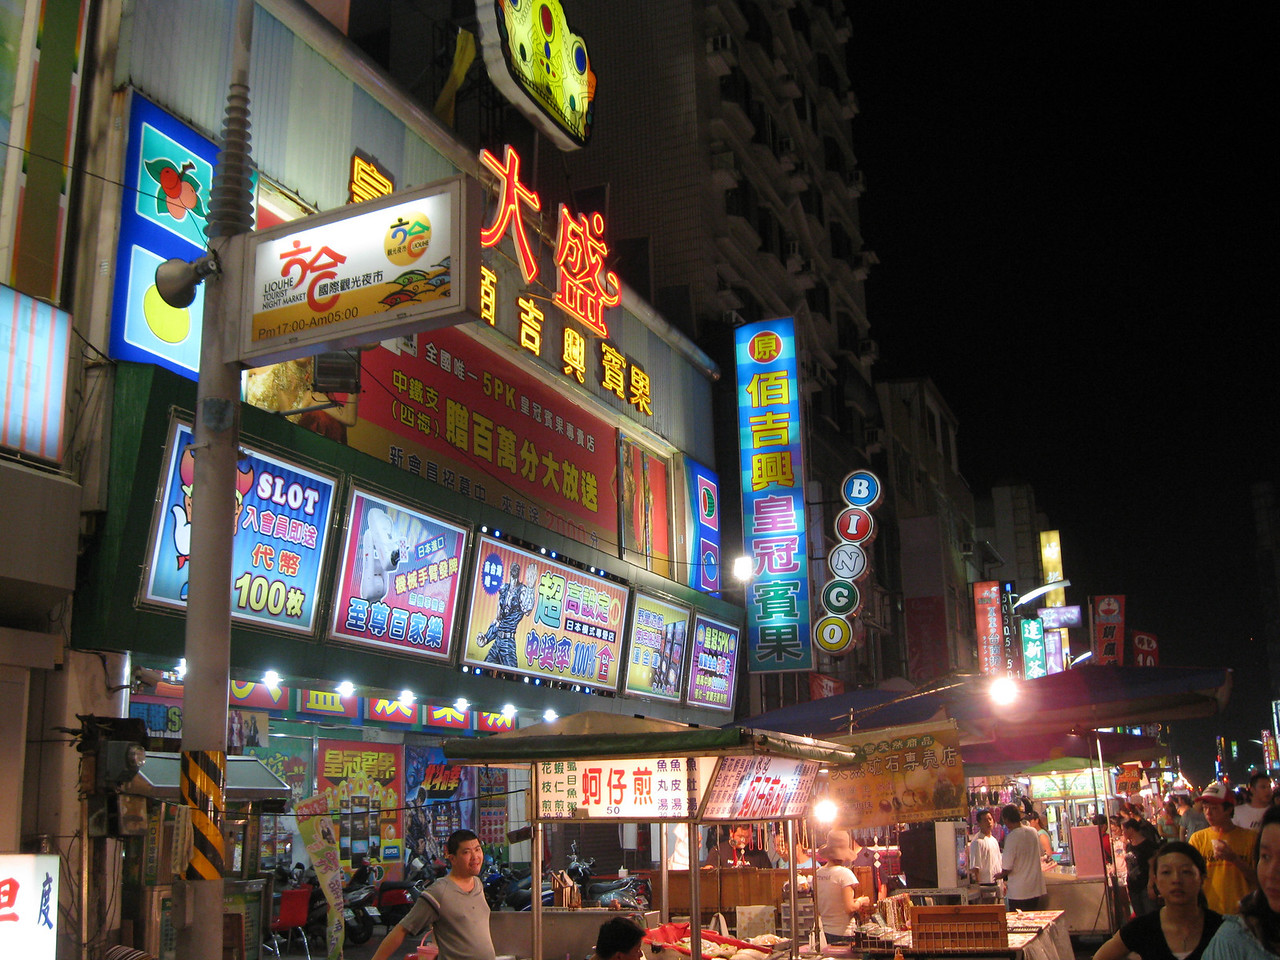 Arcade at the Liuhe Night Market